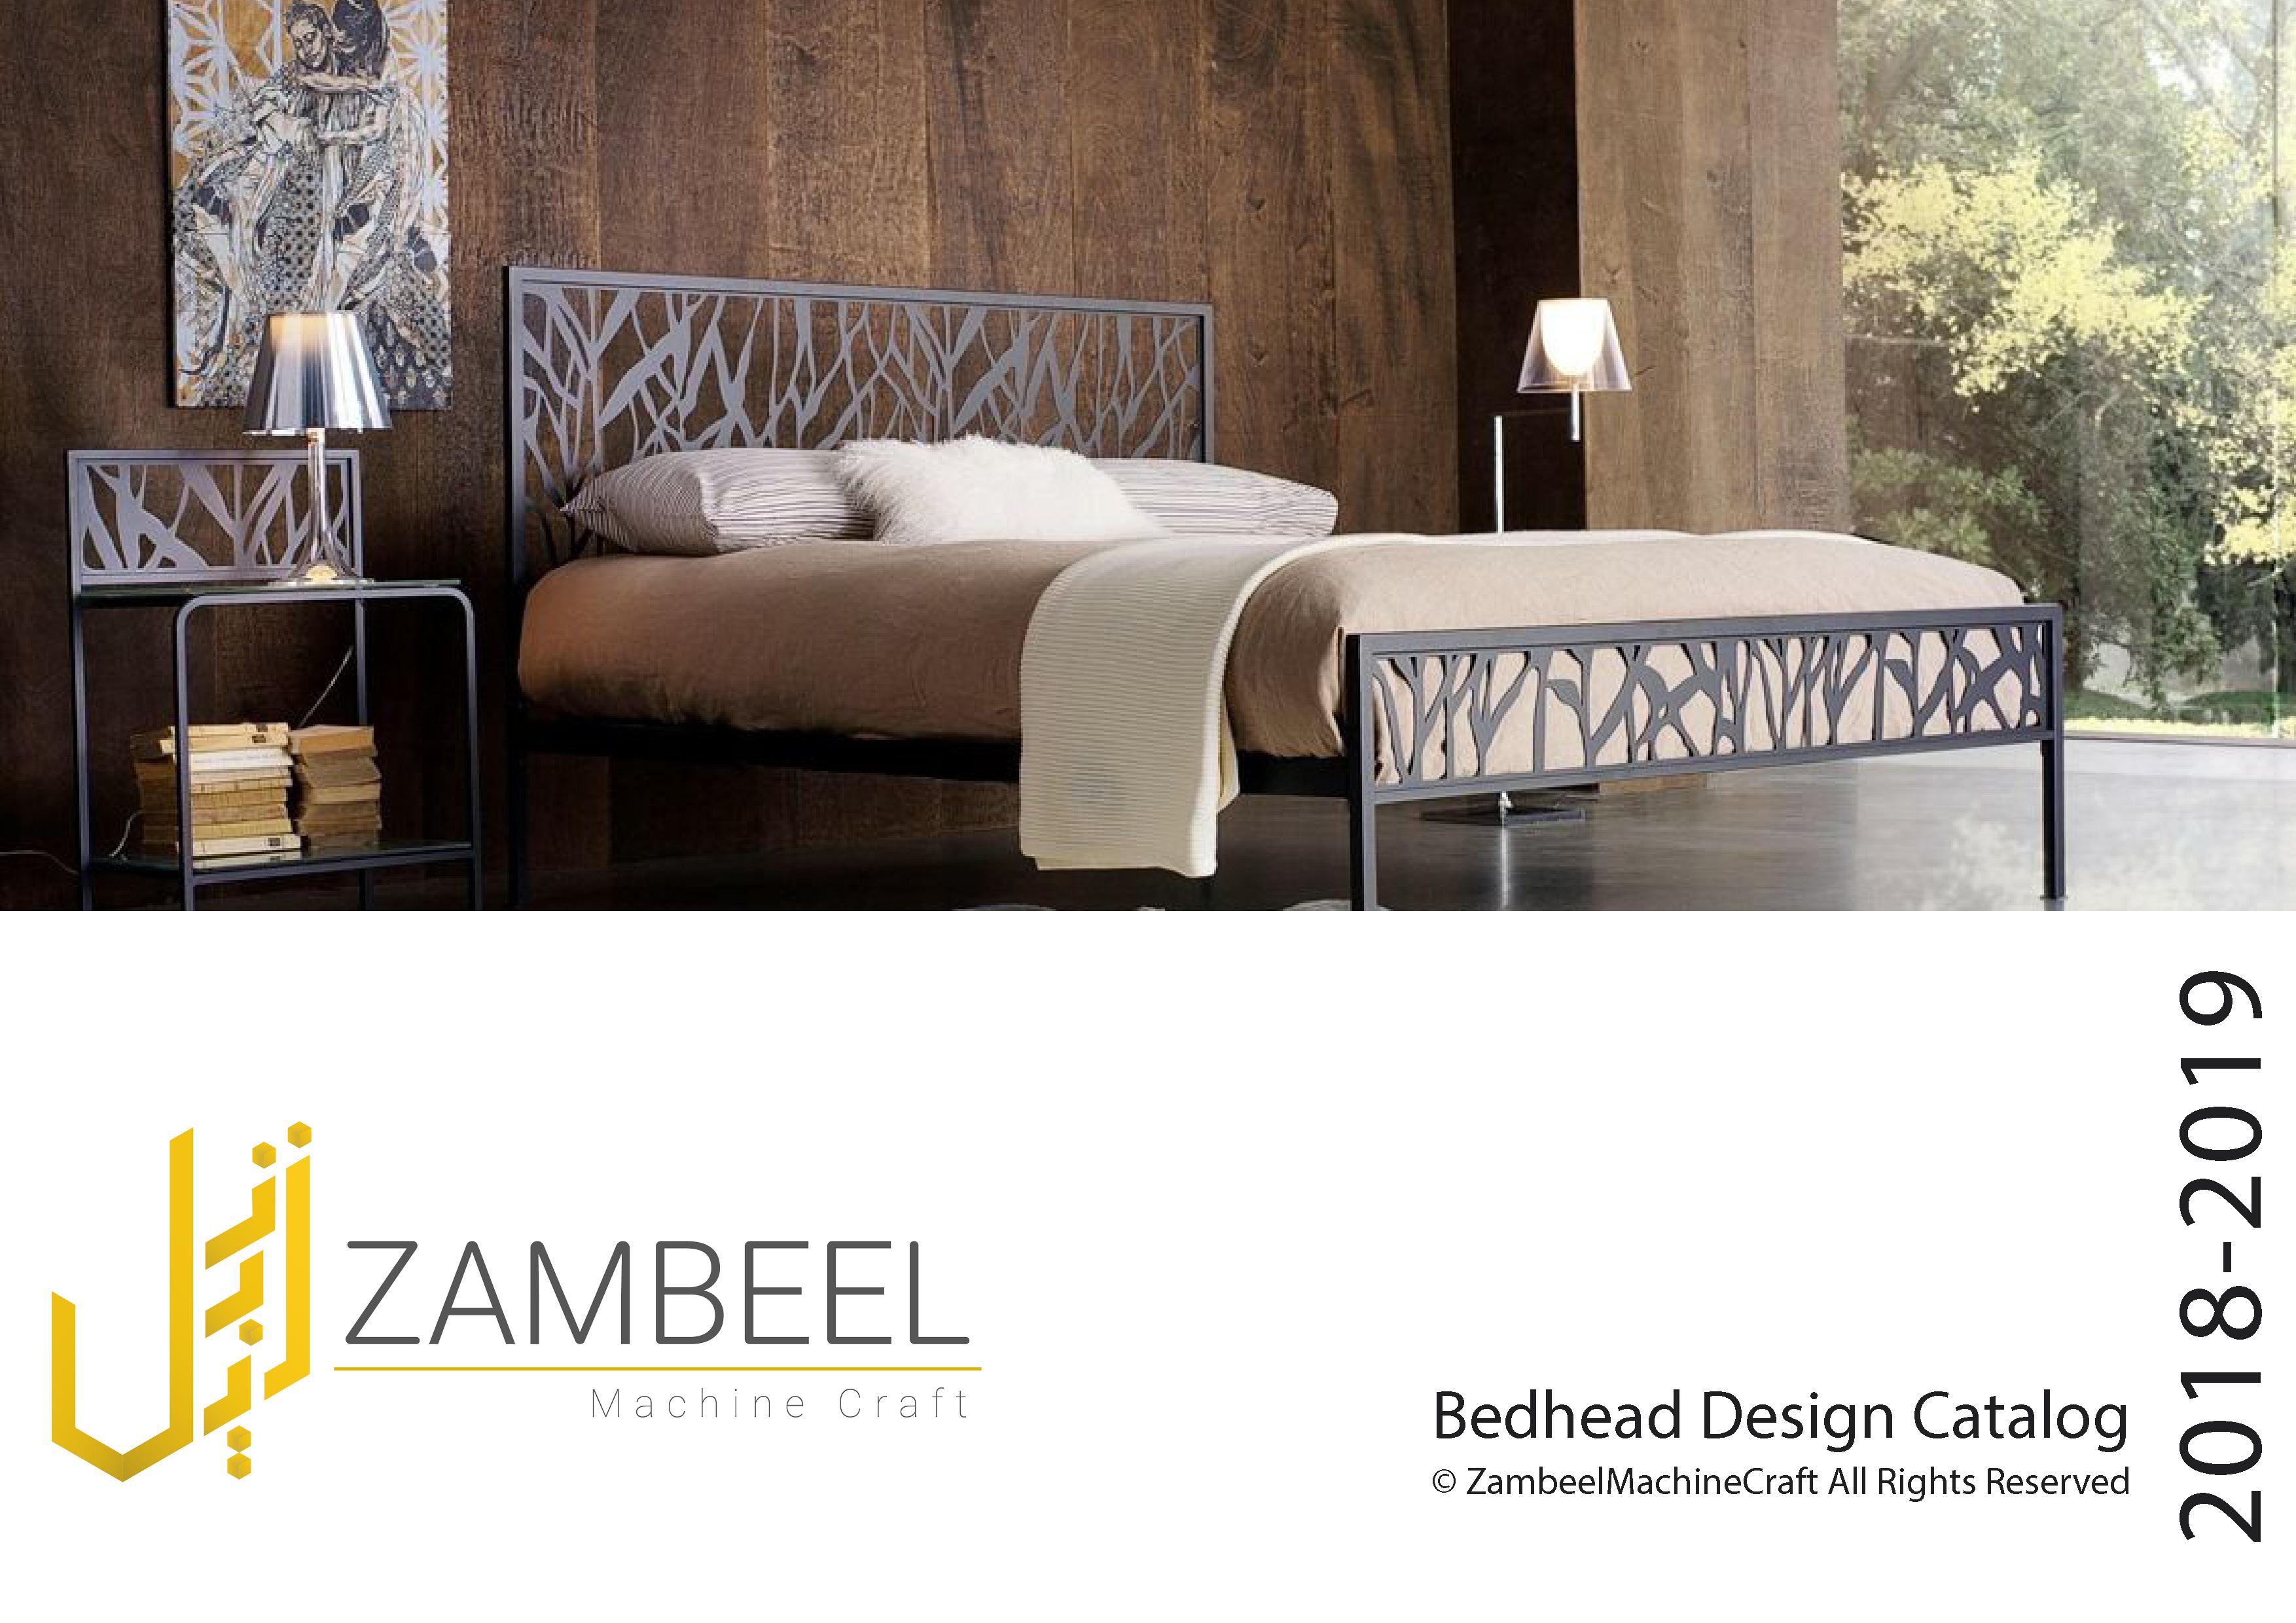 Zambeel Machine Craft Interior Design Catalogs